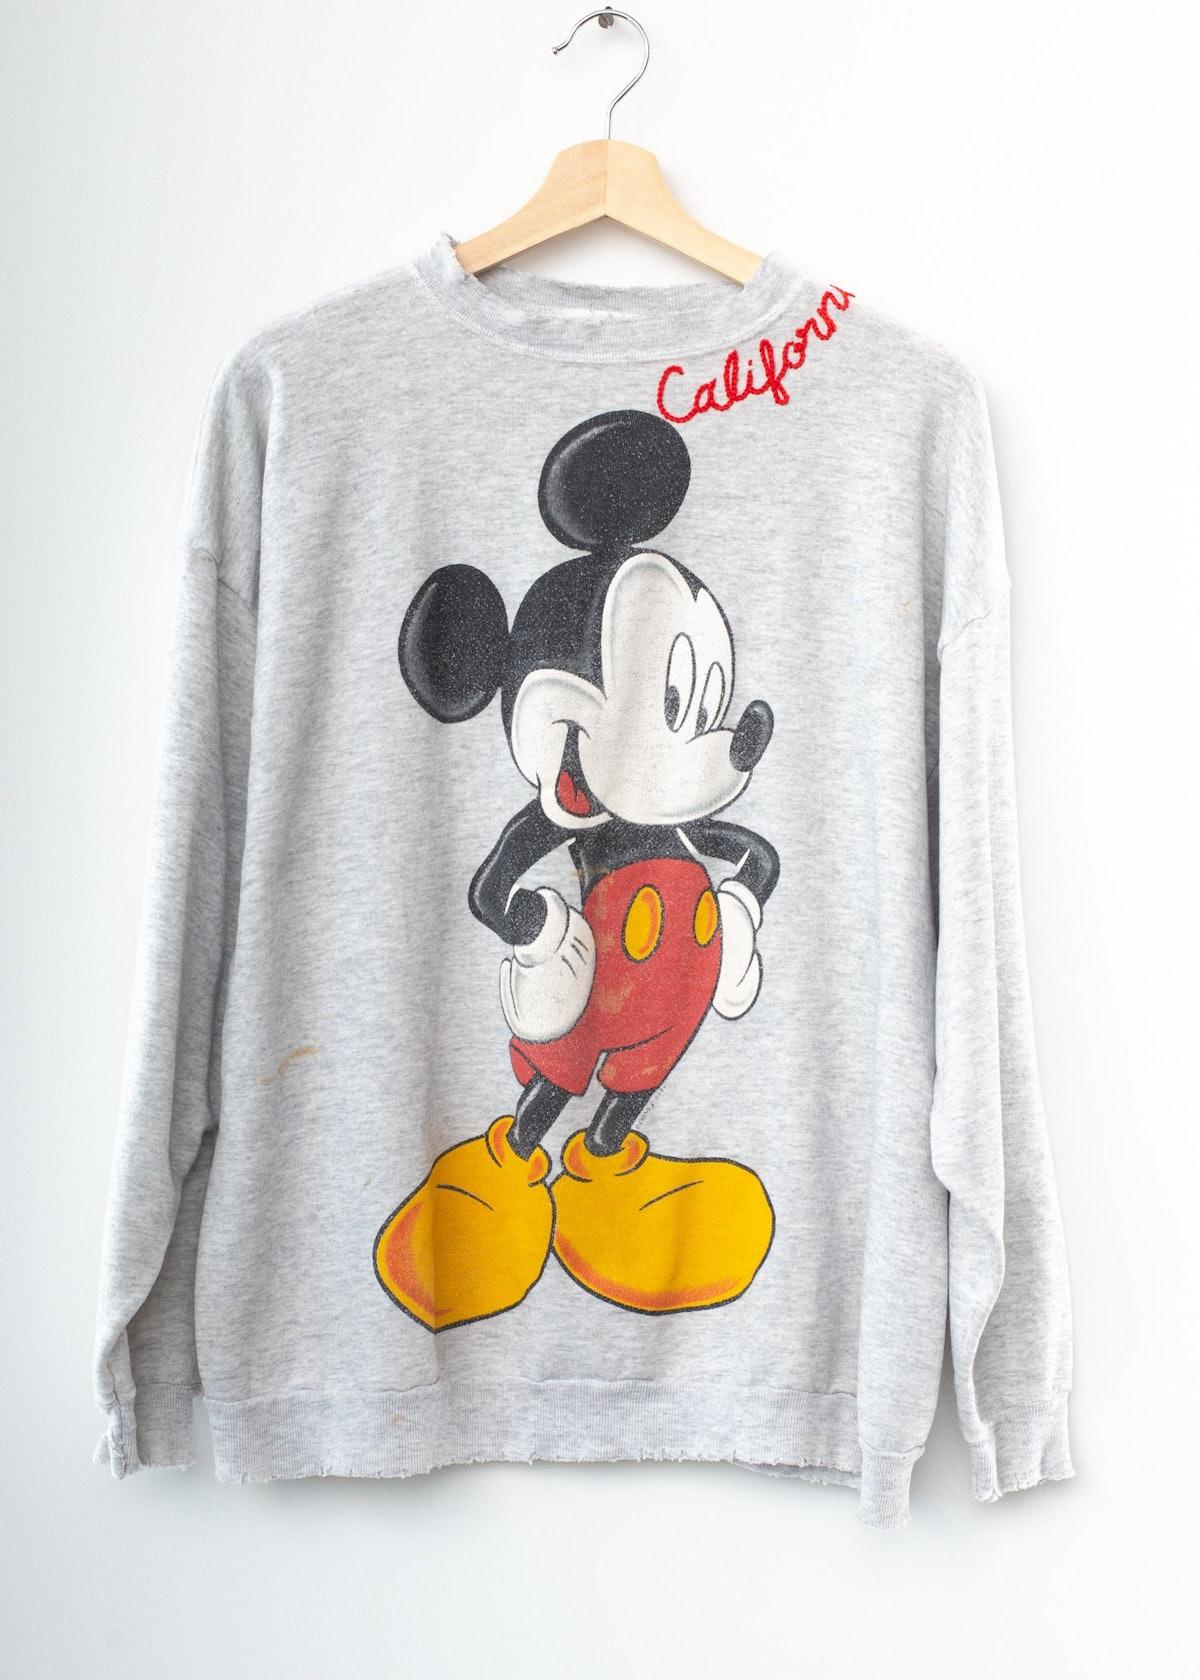 Vintage Mickey & California Embroidery Sweatshirt - Heather Grey